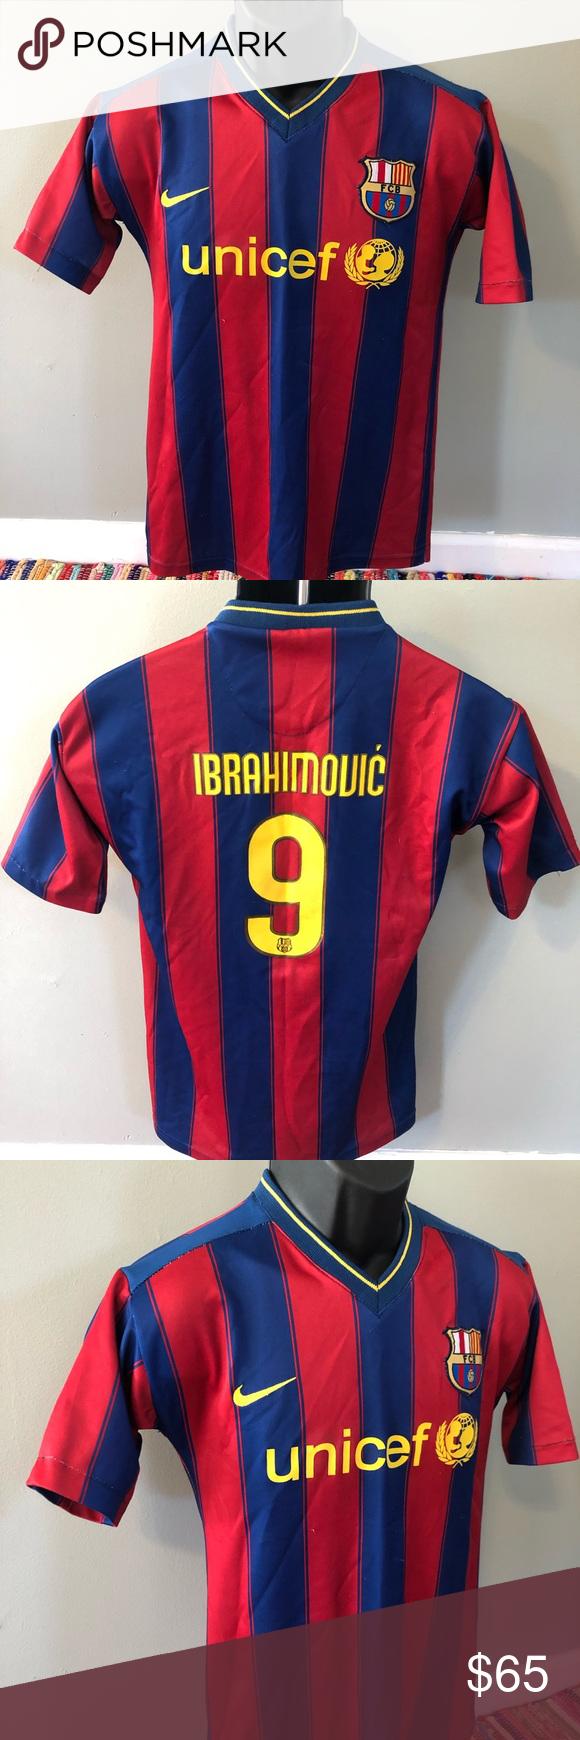 quality design 48fa6 9d9cf Nike FC Barcelona Soccer Jersey Ibrahimovic 9 FCB Nike ...